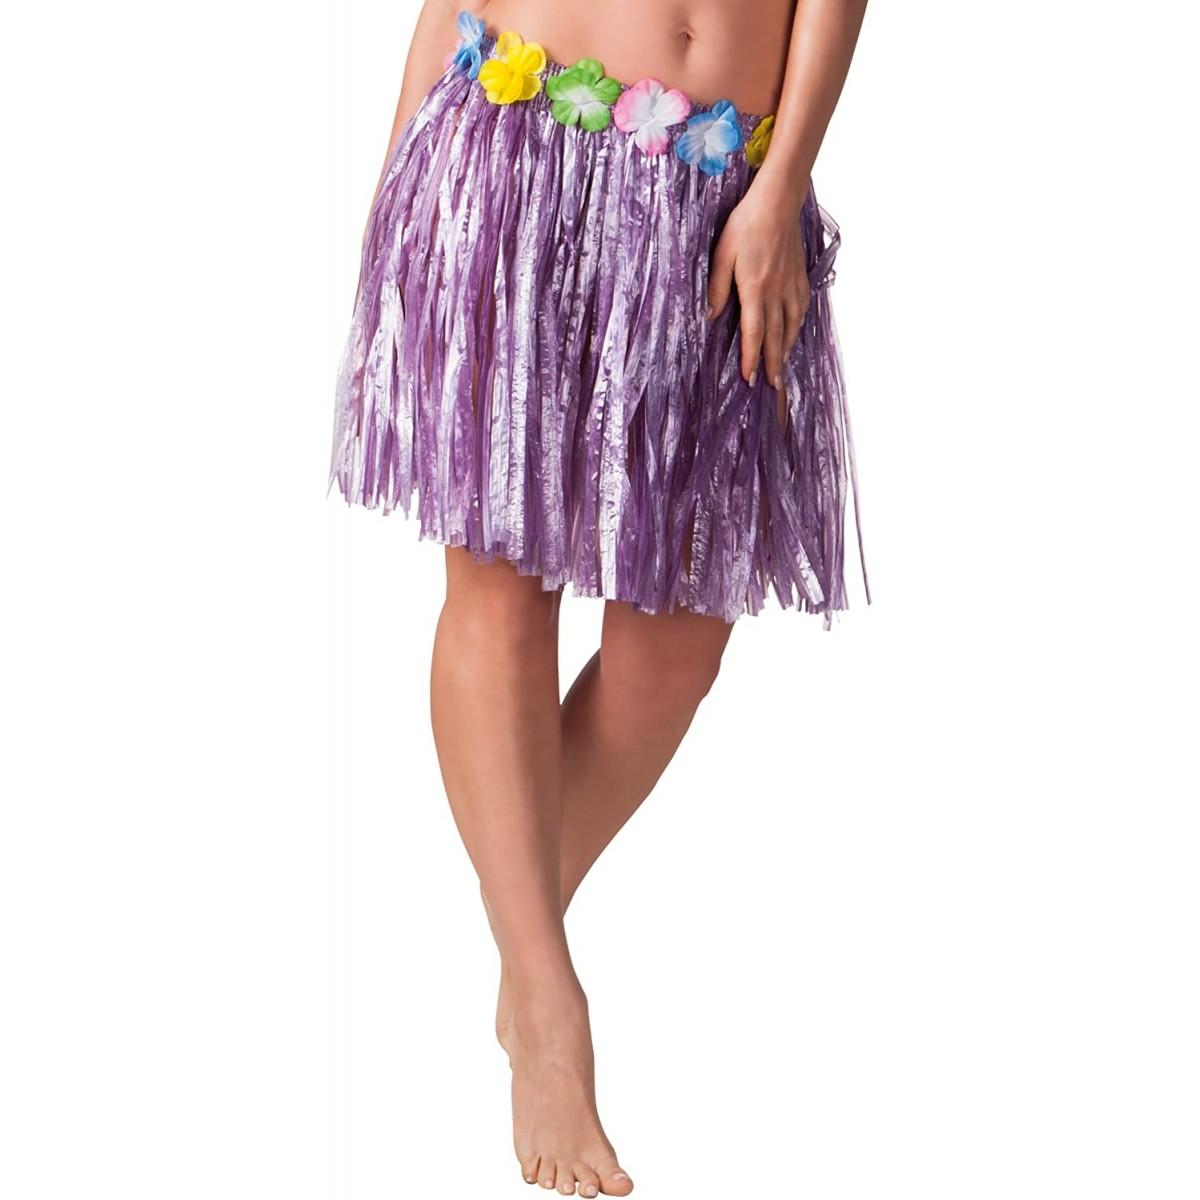 Gonna Hawaiana viola, da 45 cm, elasticizzata